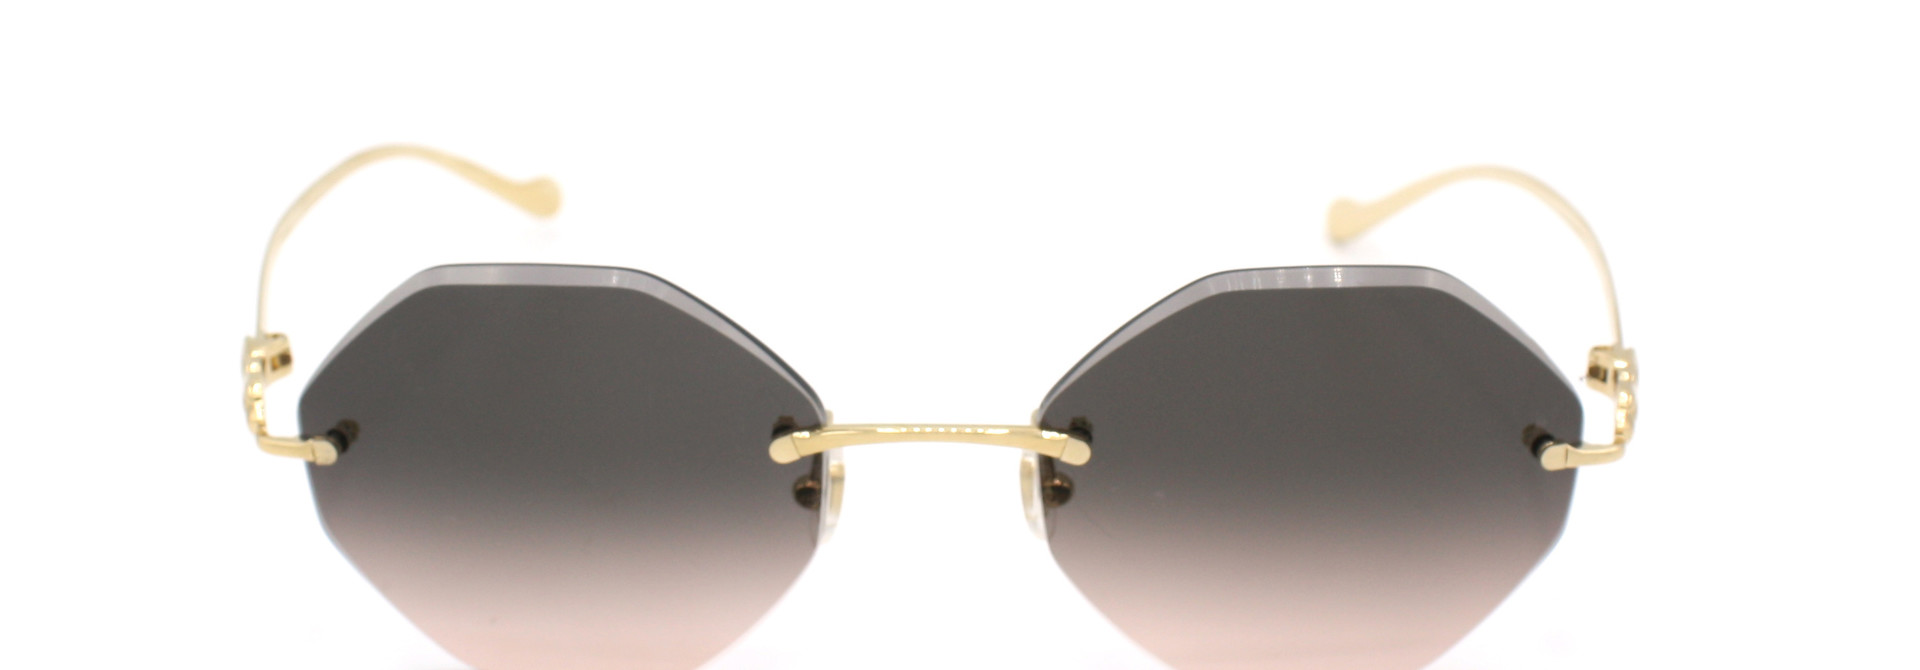 Cartier - CT0061O - 002 Dolce Diamond Cut